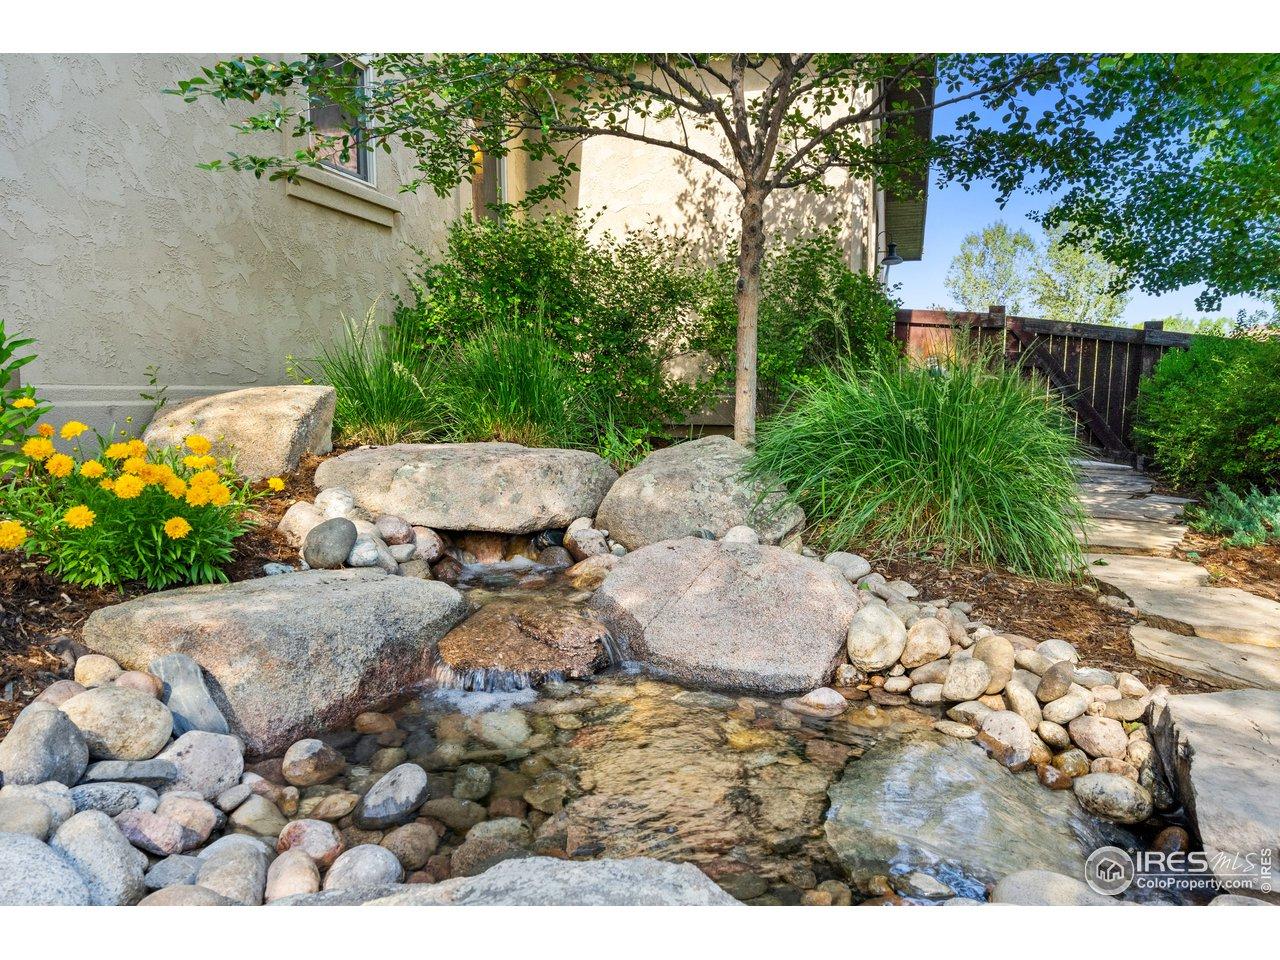 Your own backyard babbling brook